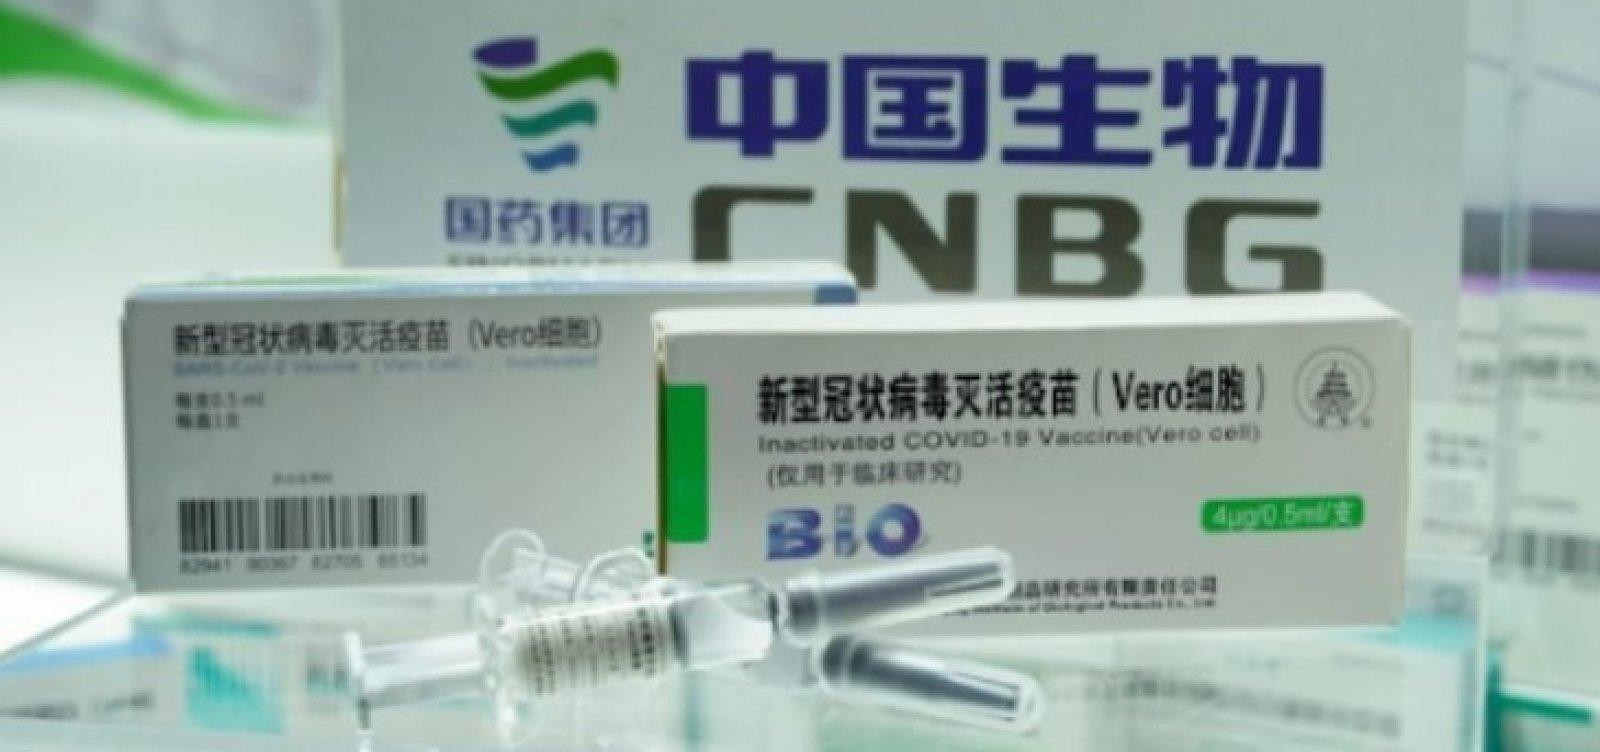 OMS aprova uso emergencial da vacina chinesa Sinopharm contra Covid